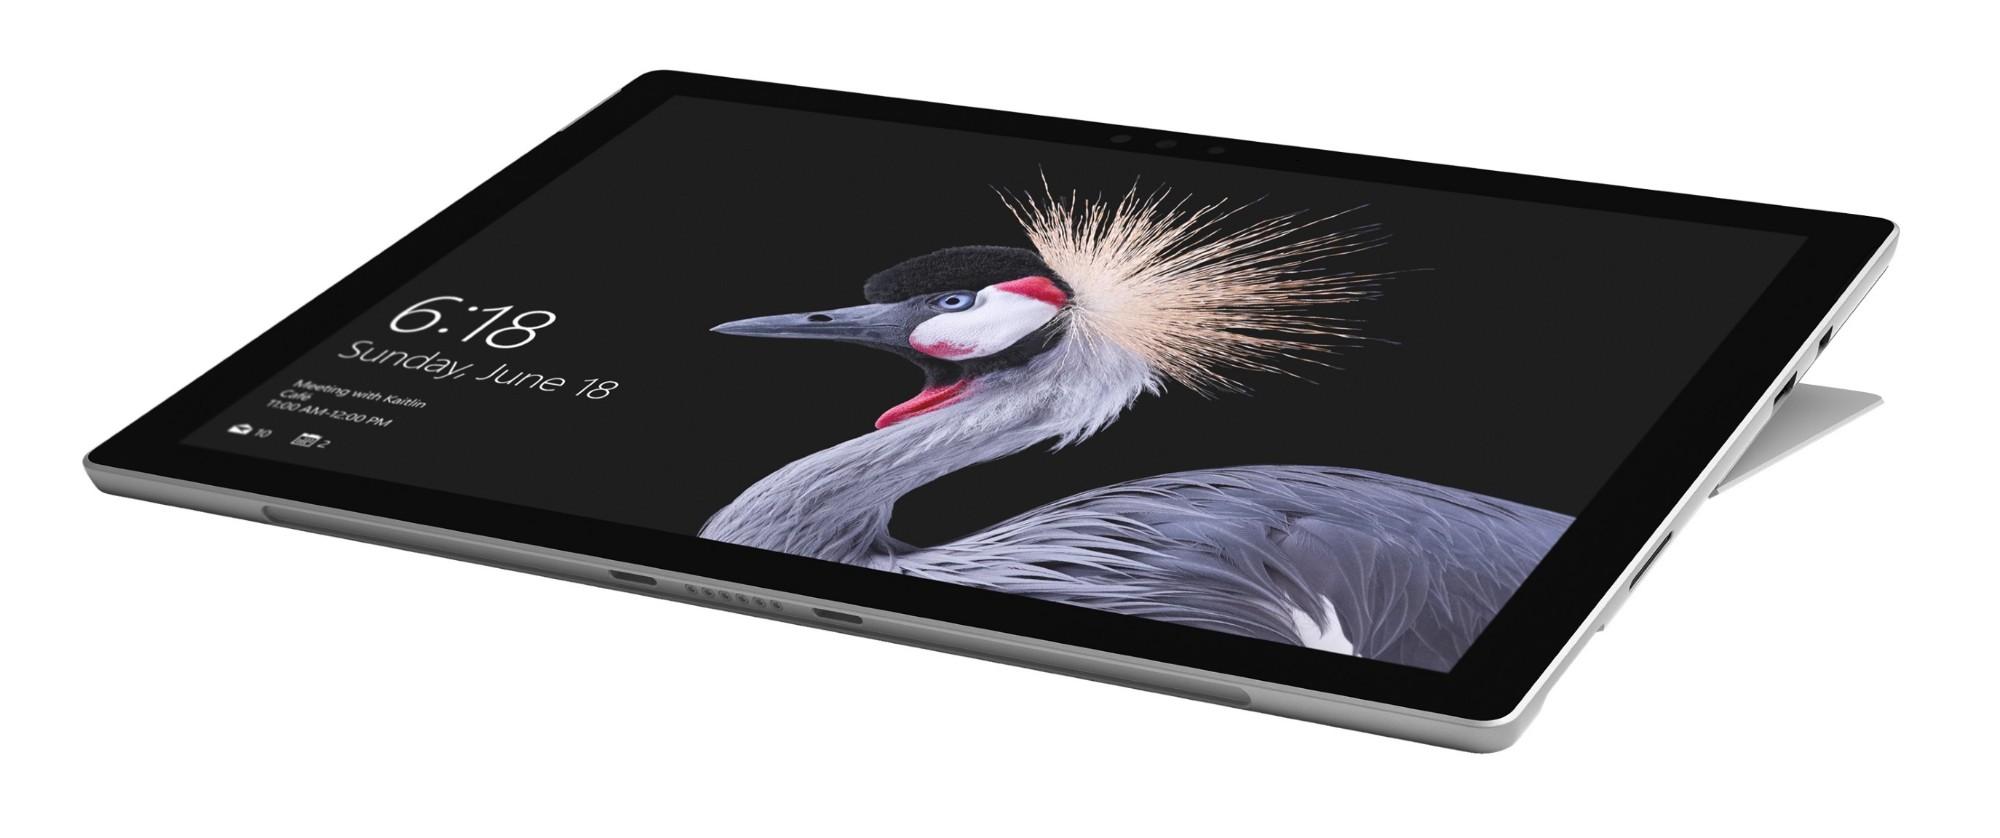 Microsoft Surface Pro tablet Intel® Core™ M m3-7Y30 128 GB Black,Silver